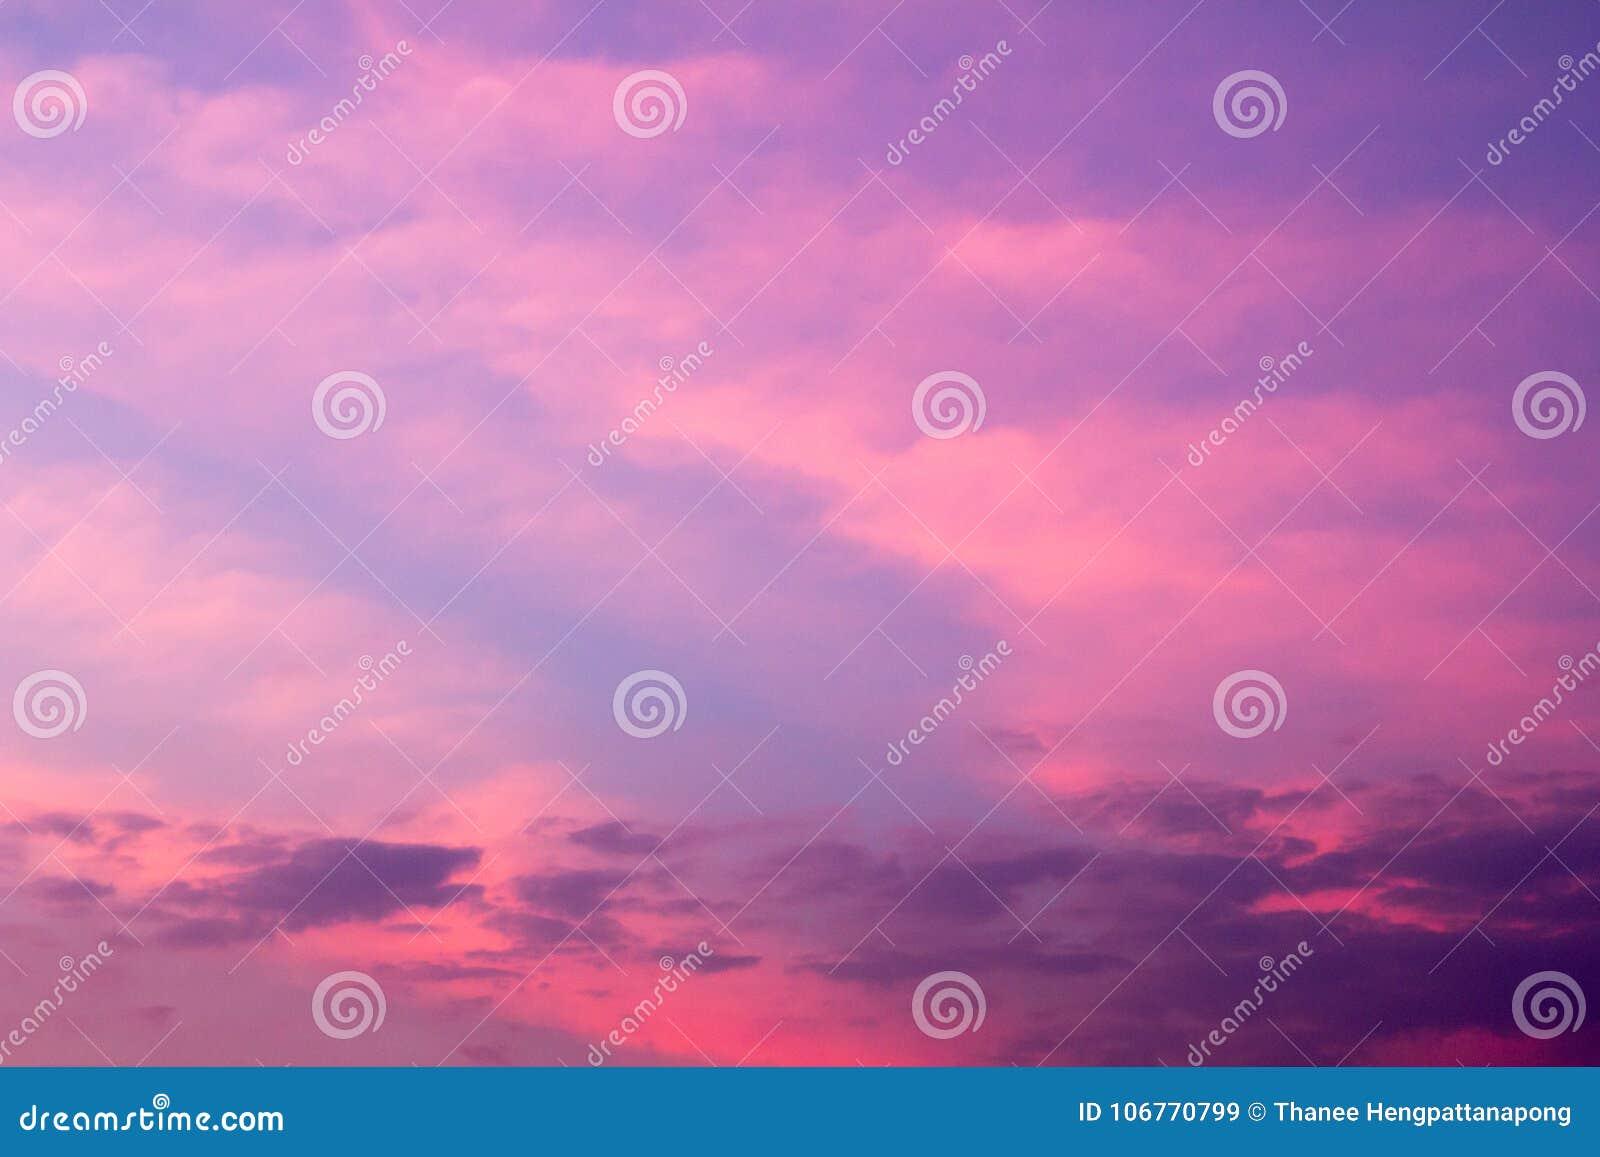 Hemelachtergrond in schemeringperiode in roze en violette kleur